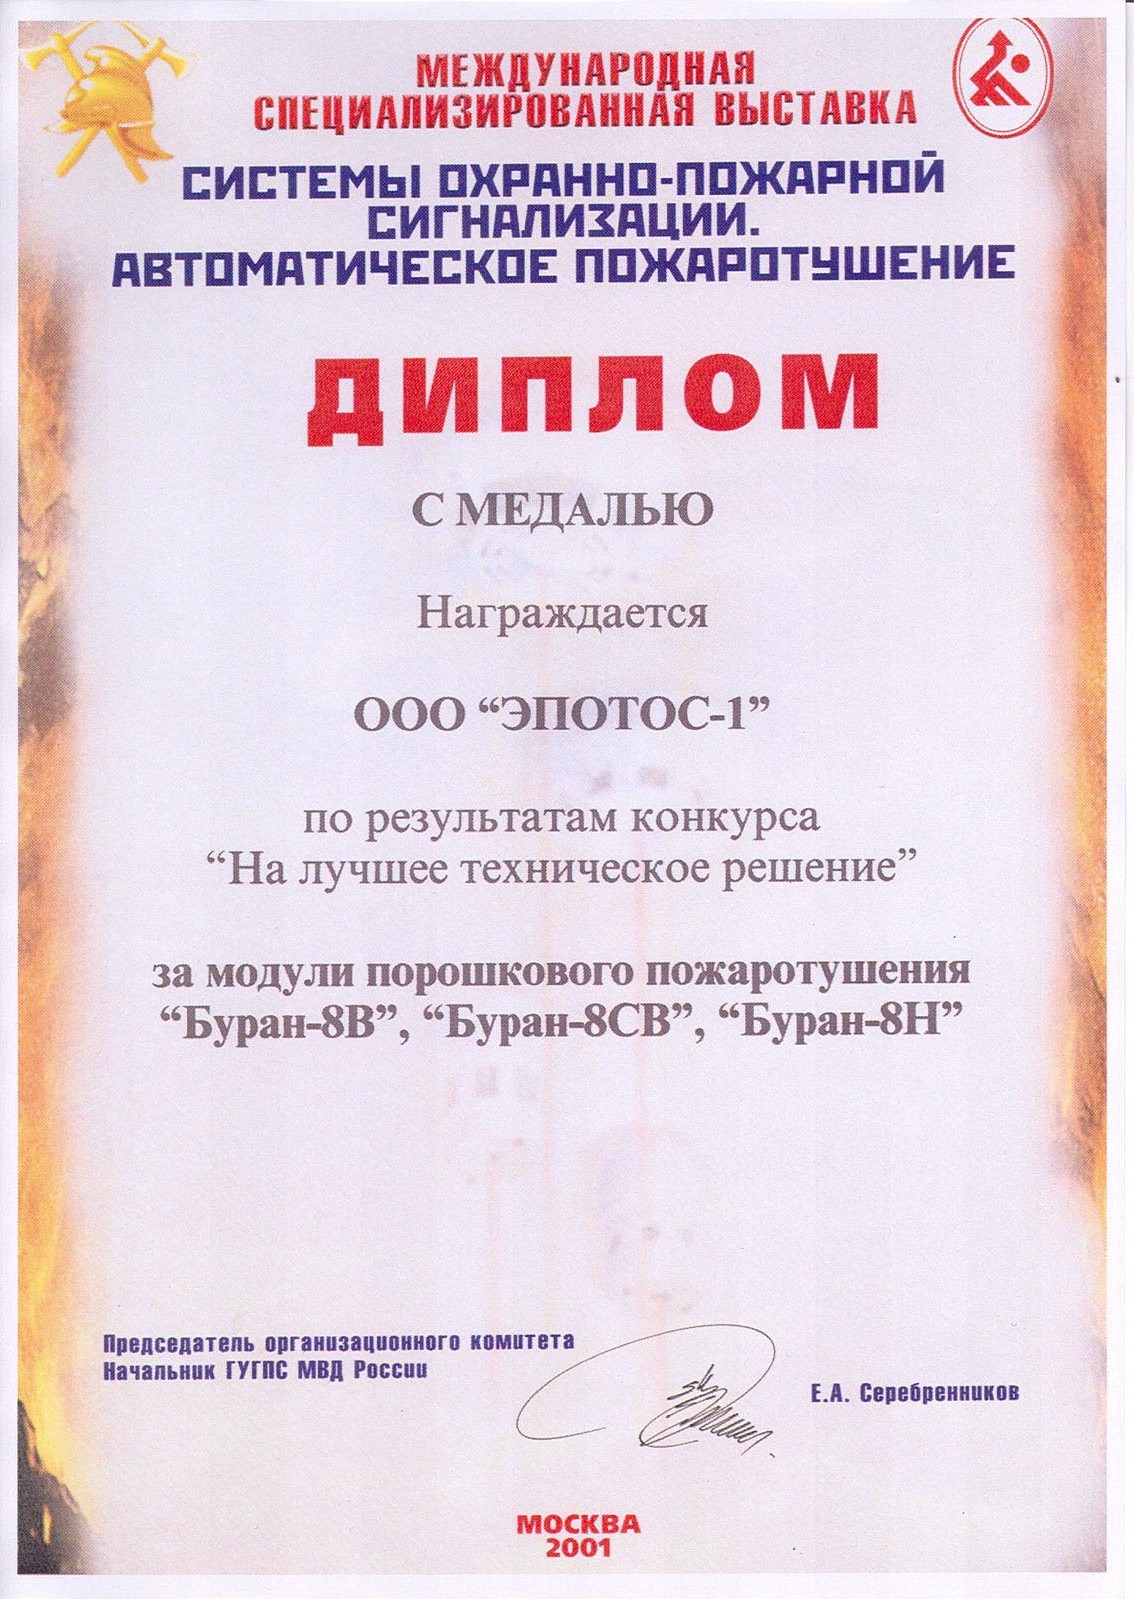 Diplom-OOO-Epotos-2001-g-2